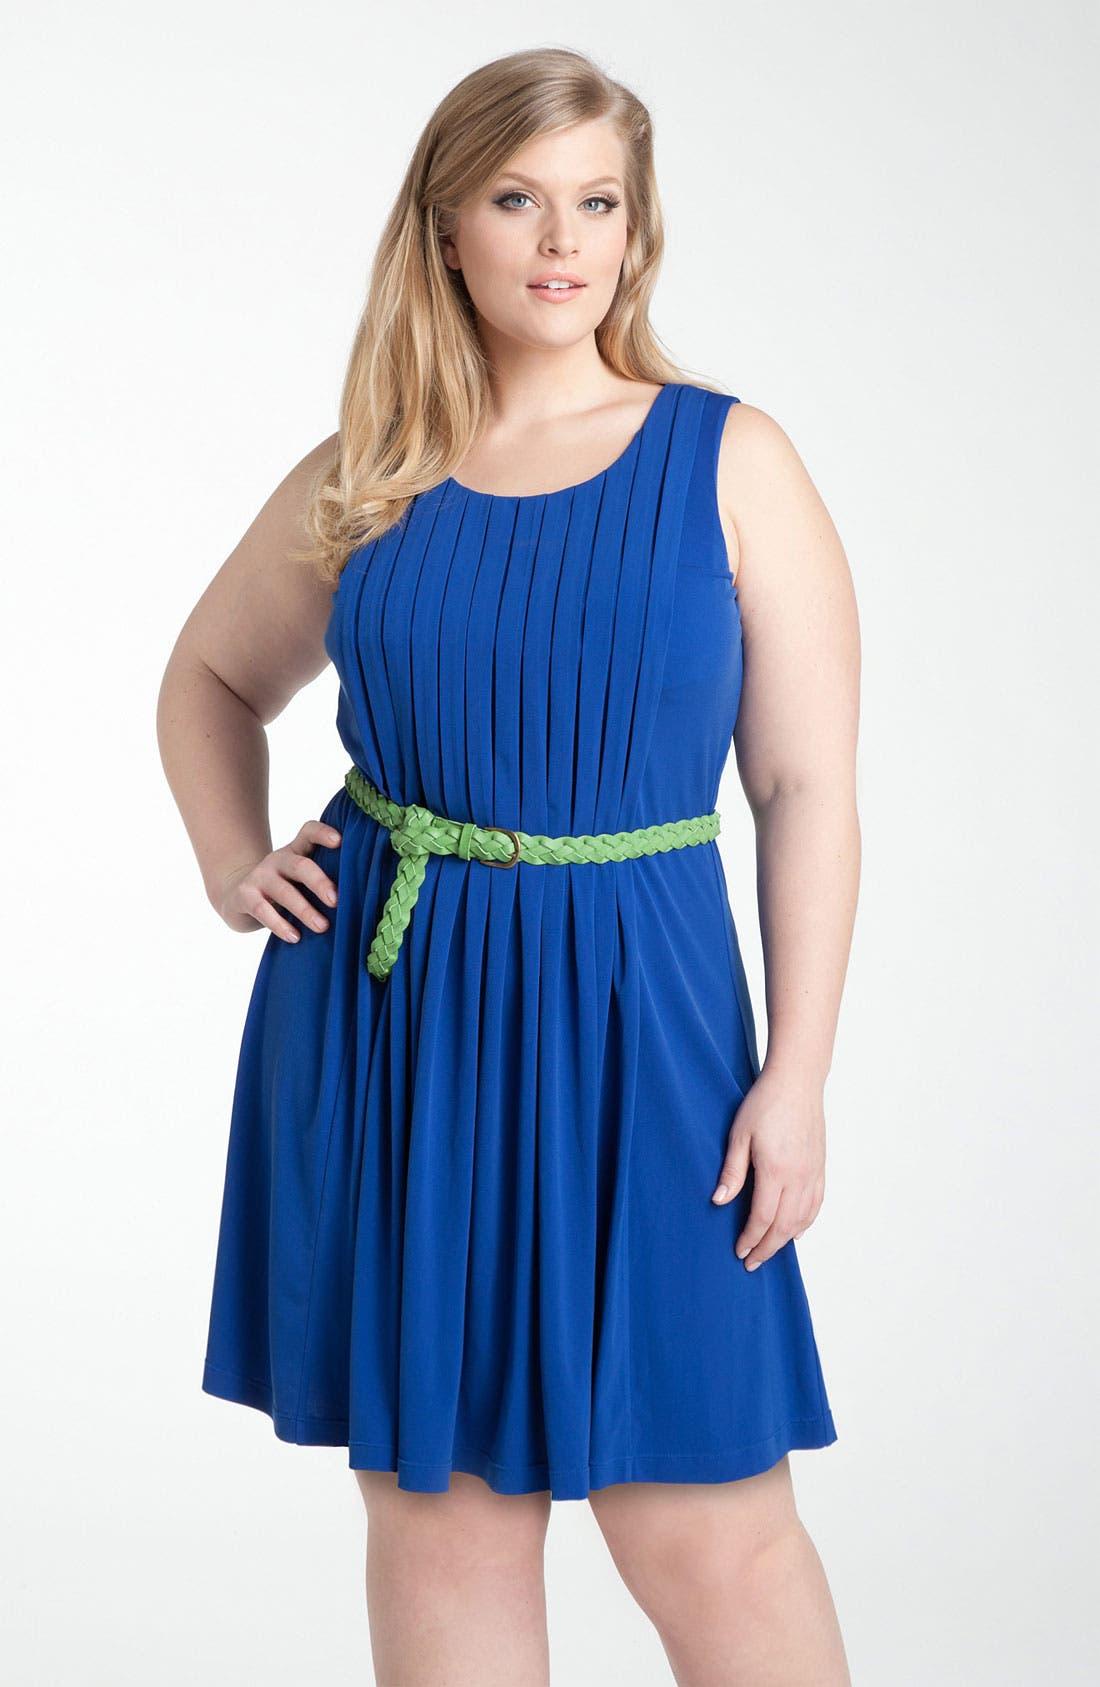 Alternate Image 1 Selected - Calvin Klein Belted Jersey Dress (Plus)